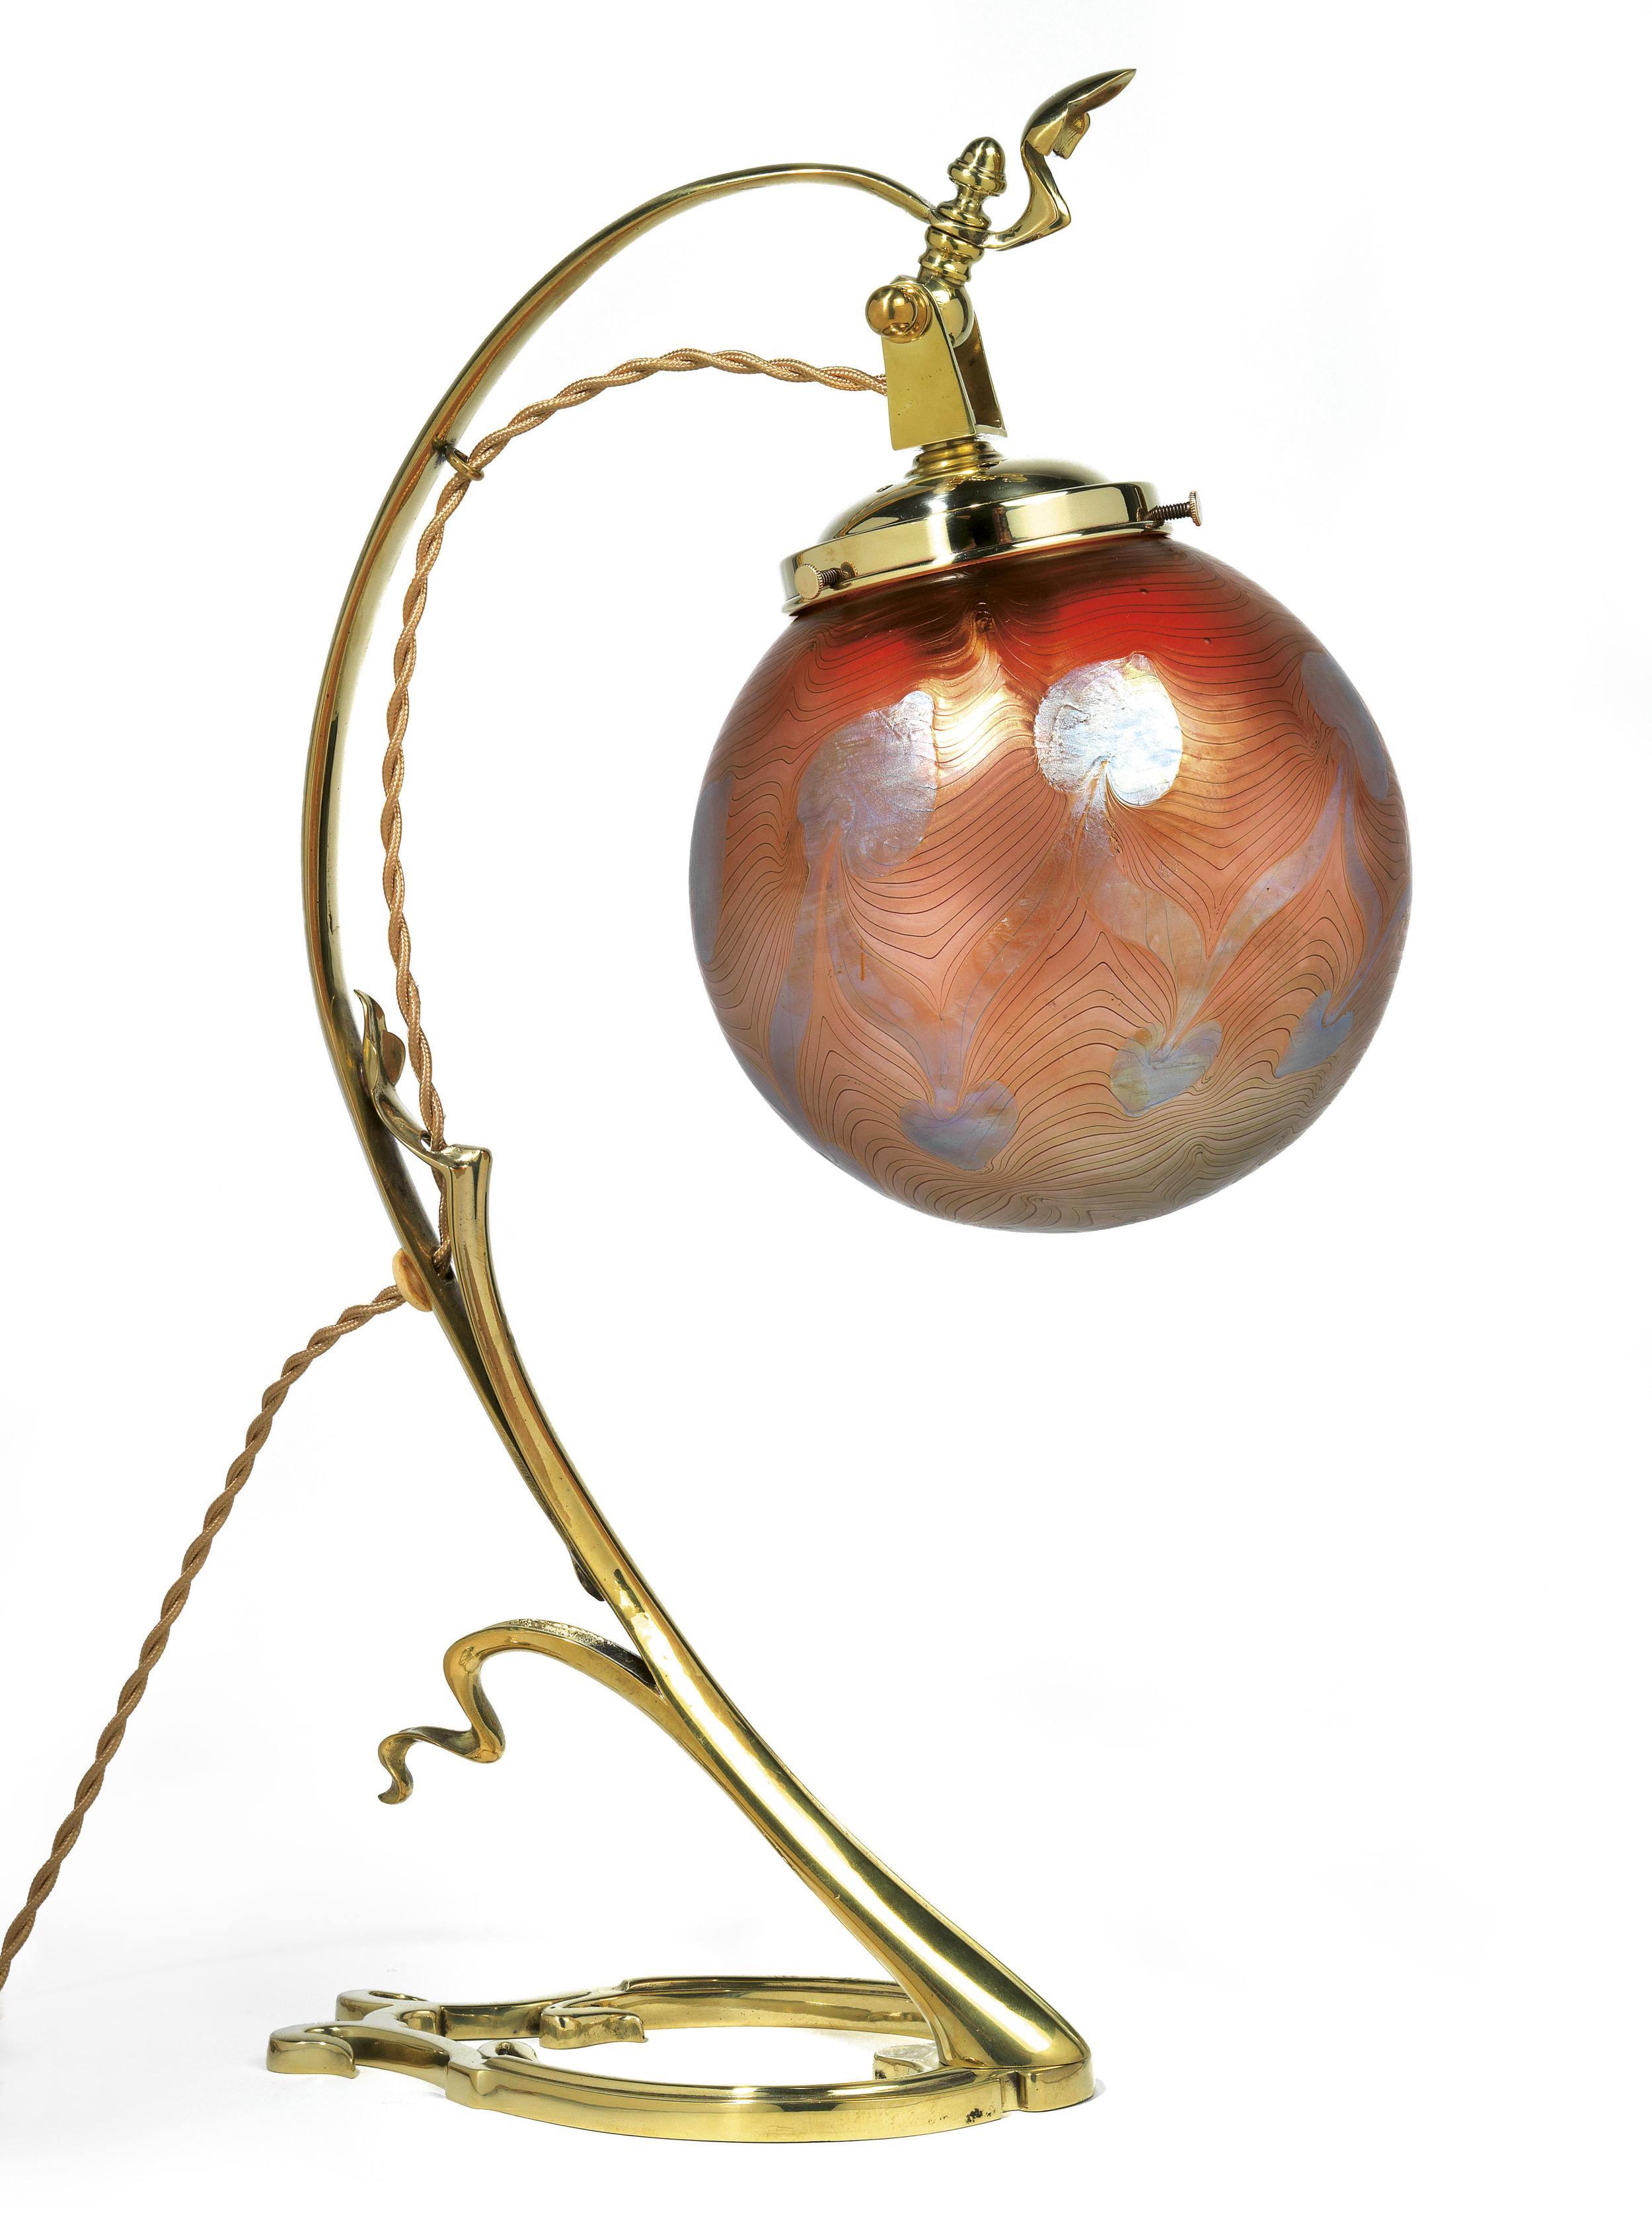 A Brass Mounted Table Lamp, Loetz, c.1901 Dorotheum Vienna